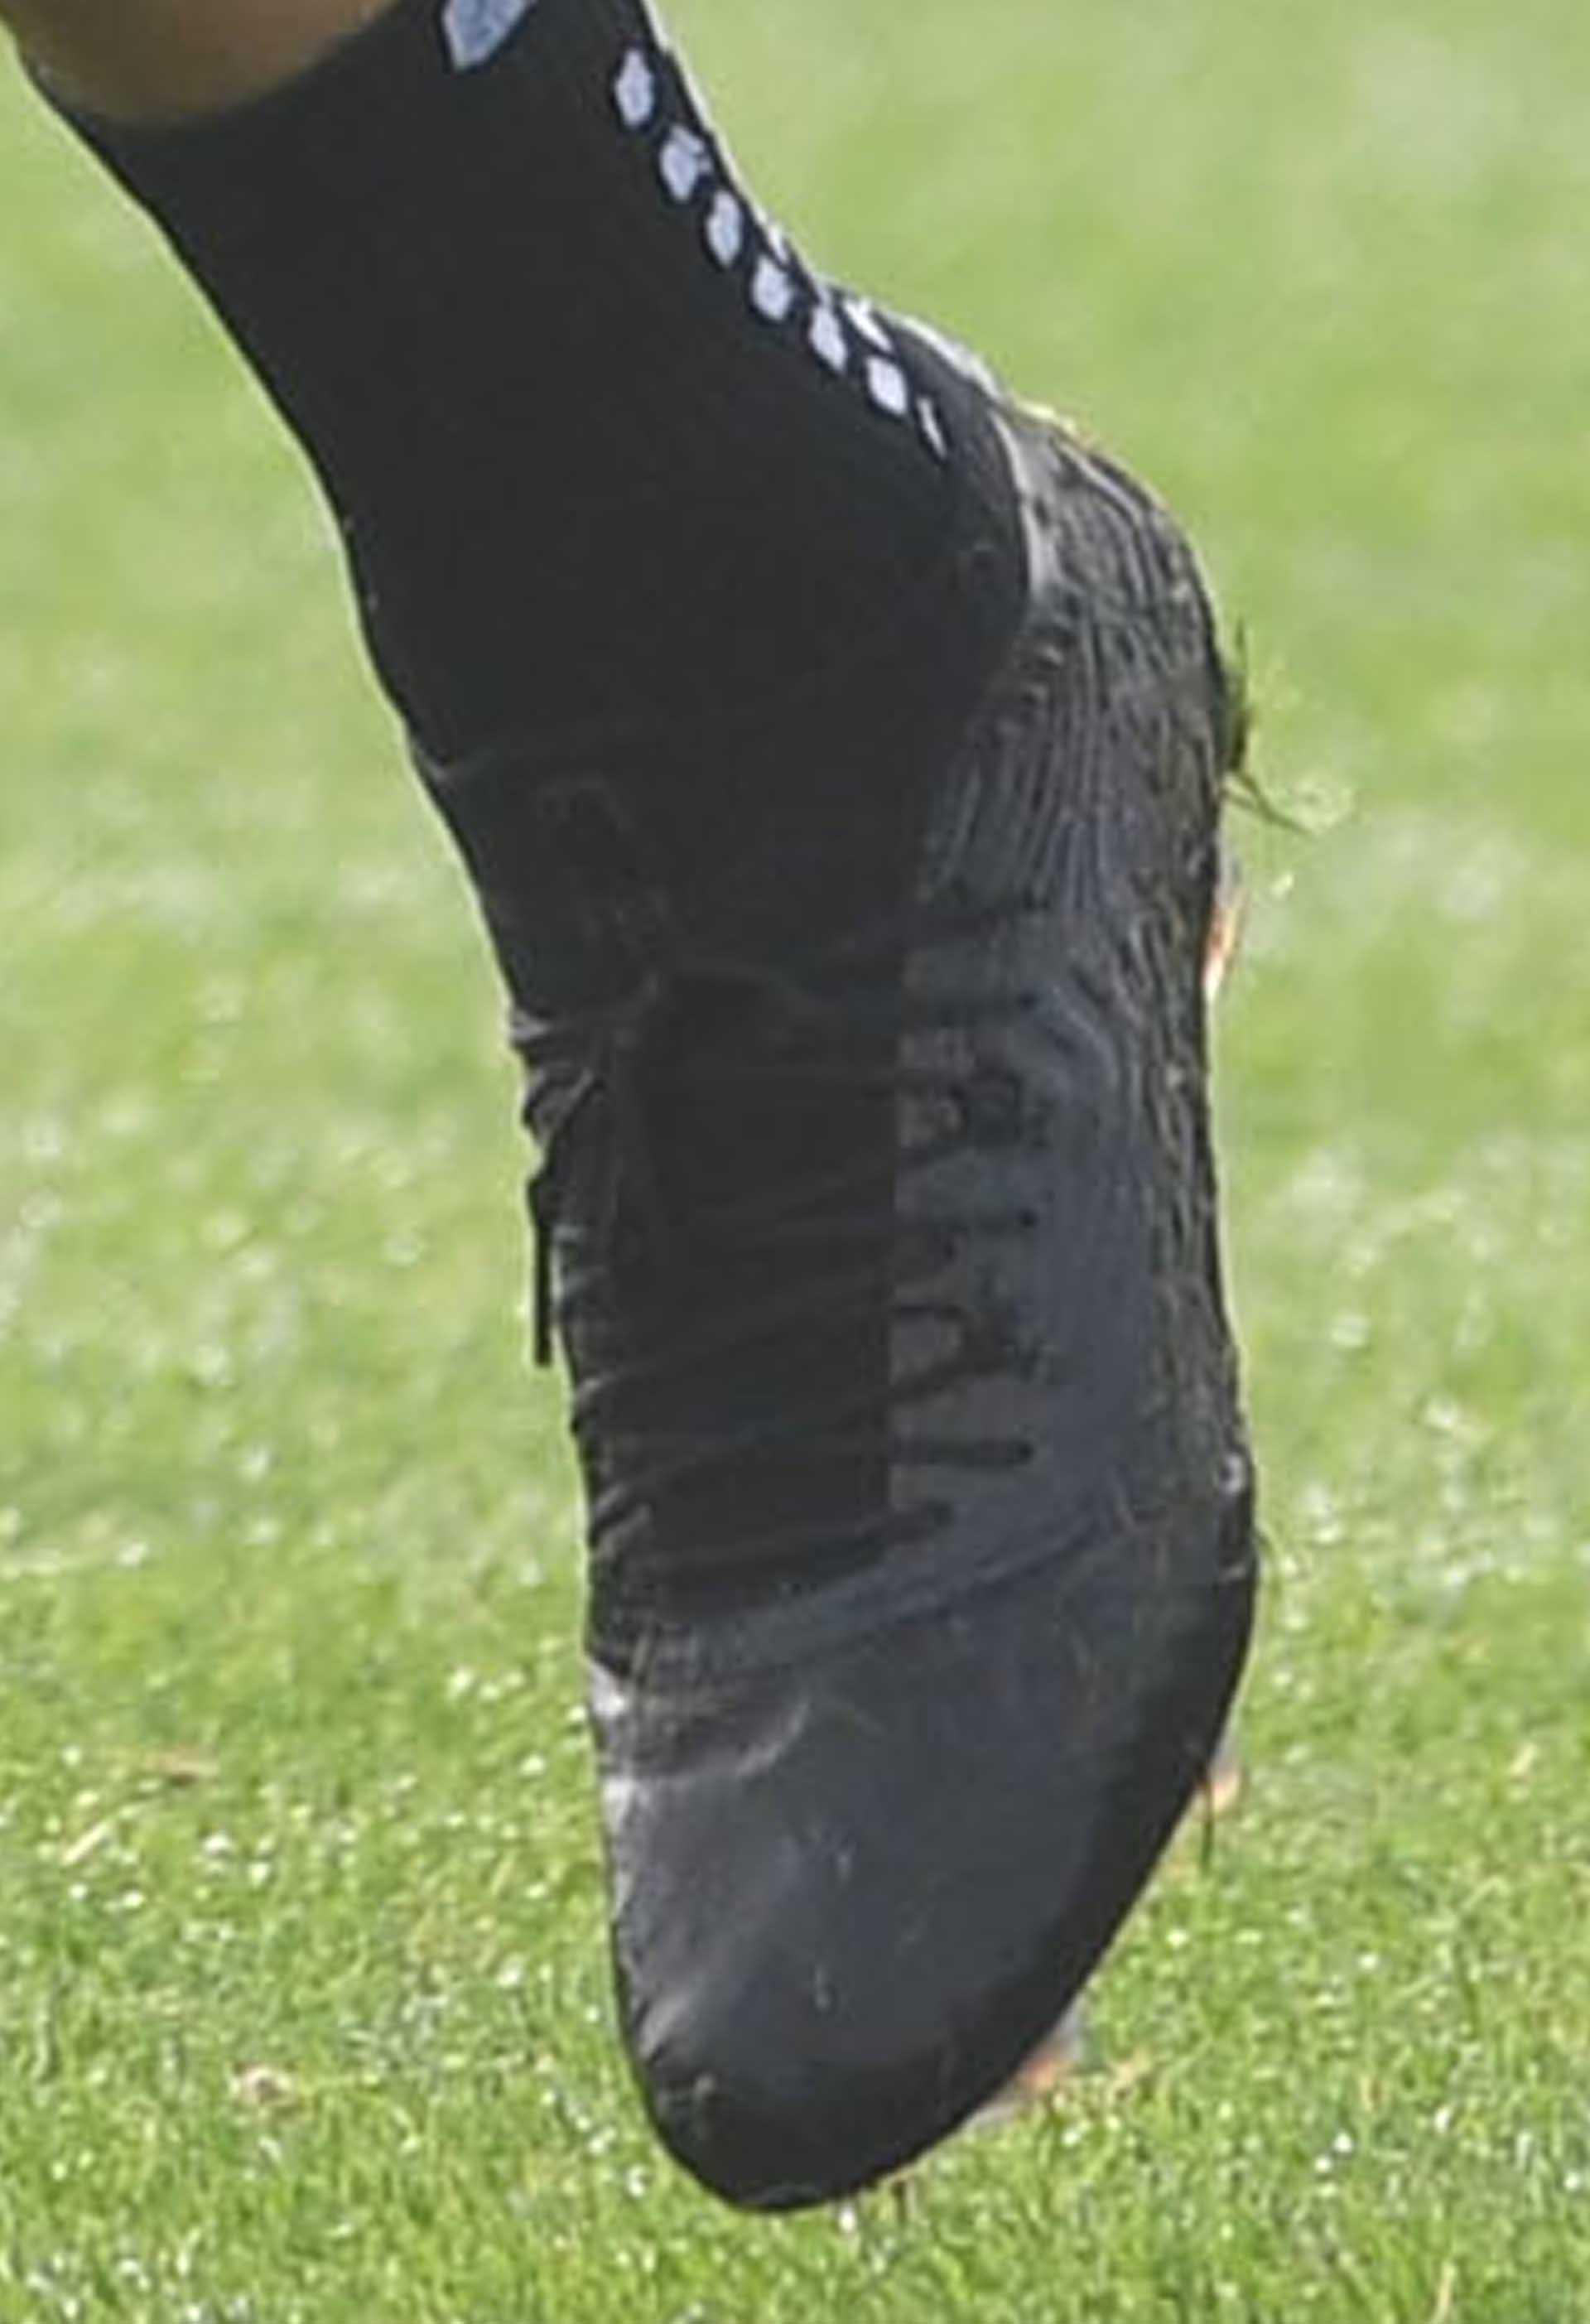 334b57f6dd2a Olivier Giroud Trains In Next-Gen PUMA Football Boots - SoccerBible